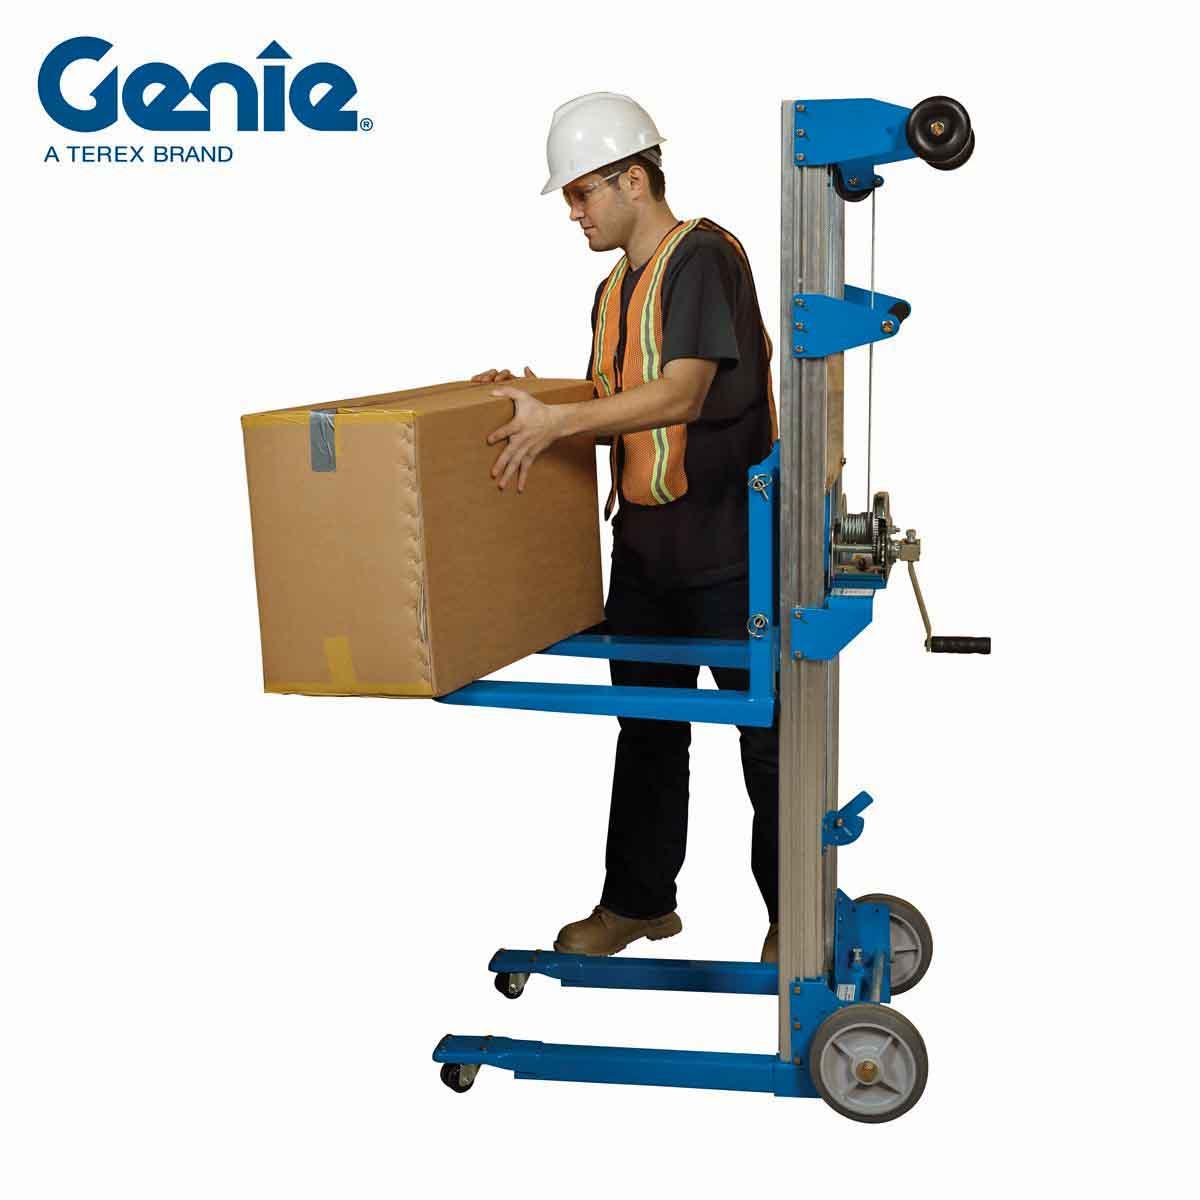 Moving Rentals: Moving Equipment For Rent, Santa Fe, TX. Serving Galveston